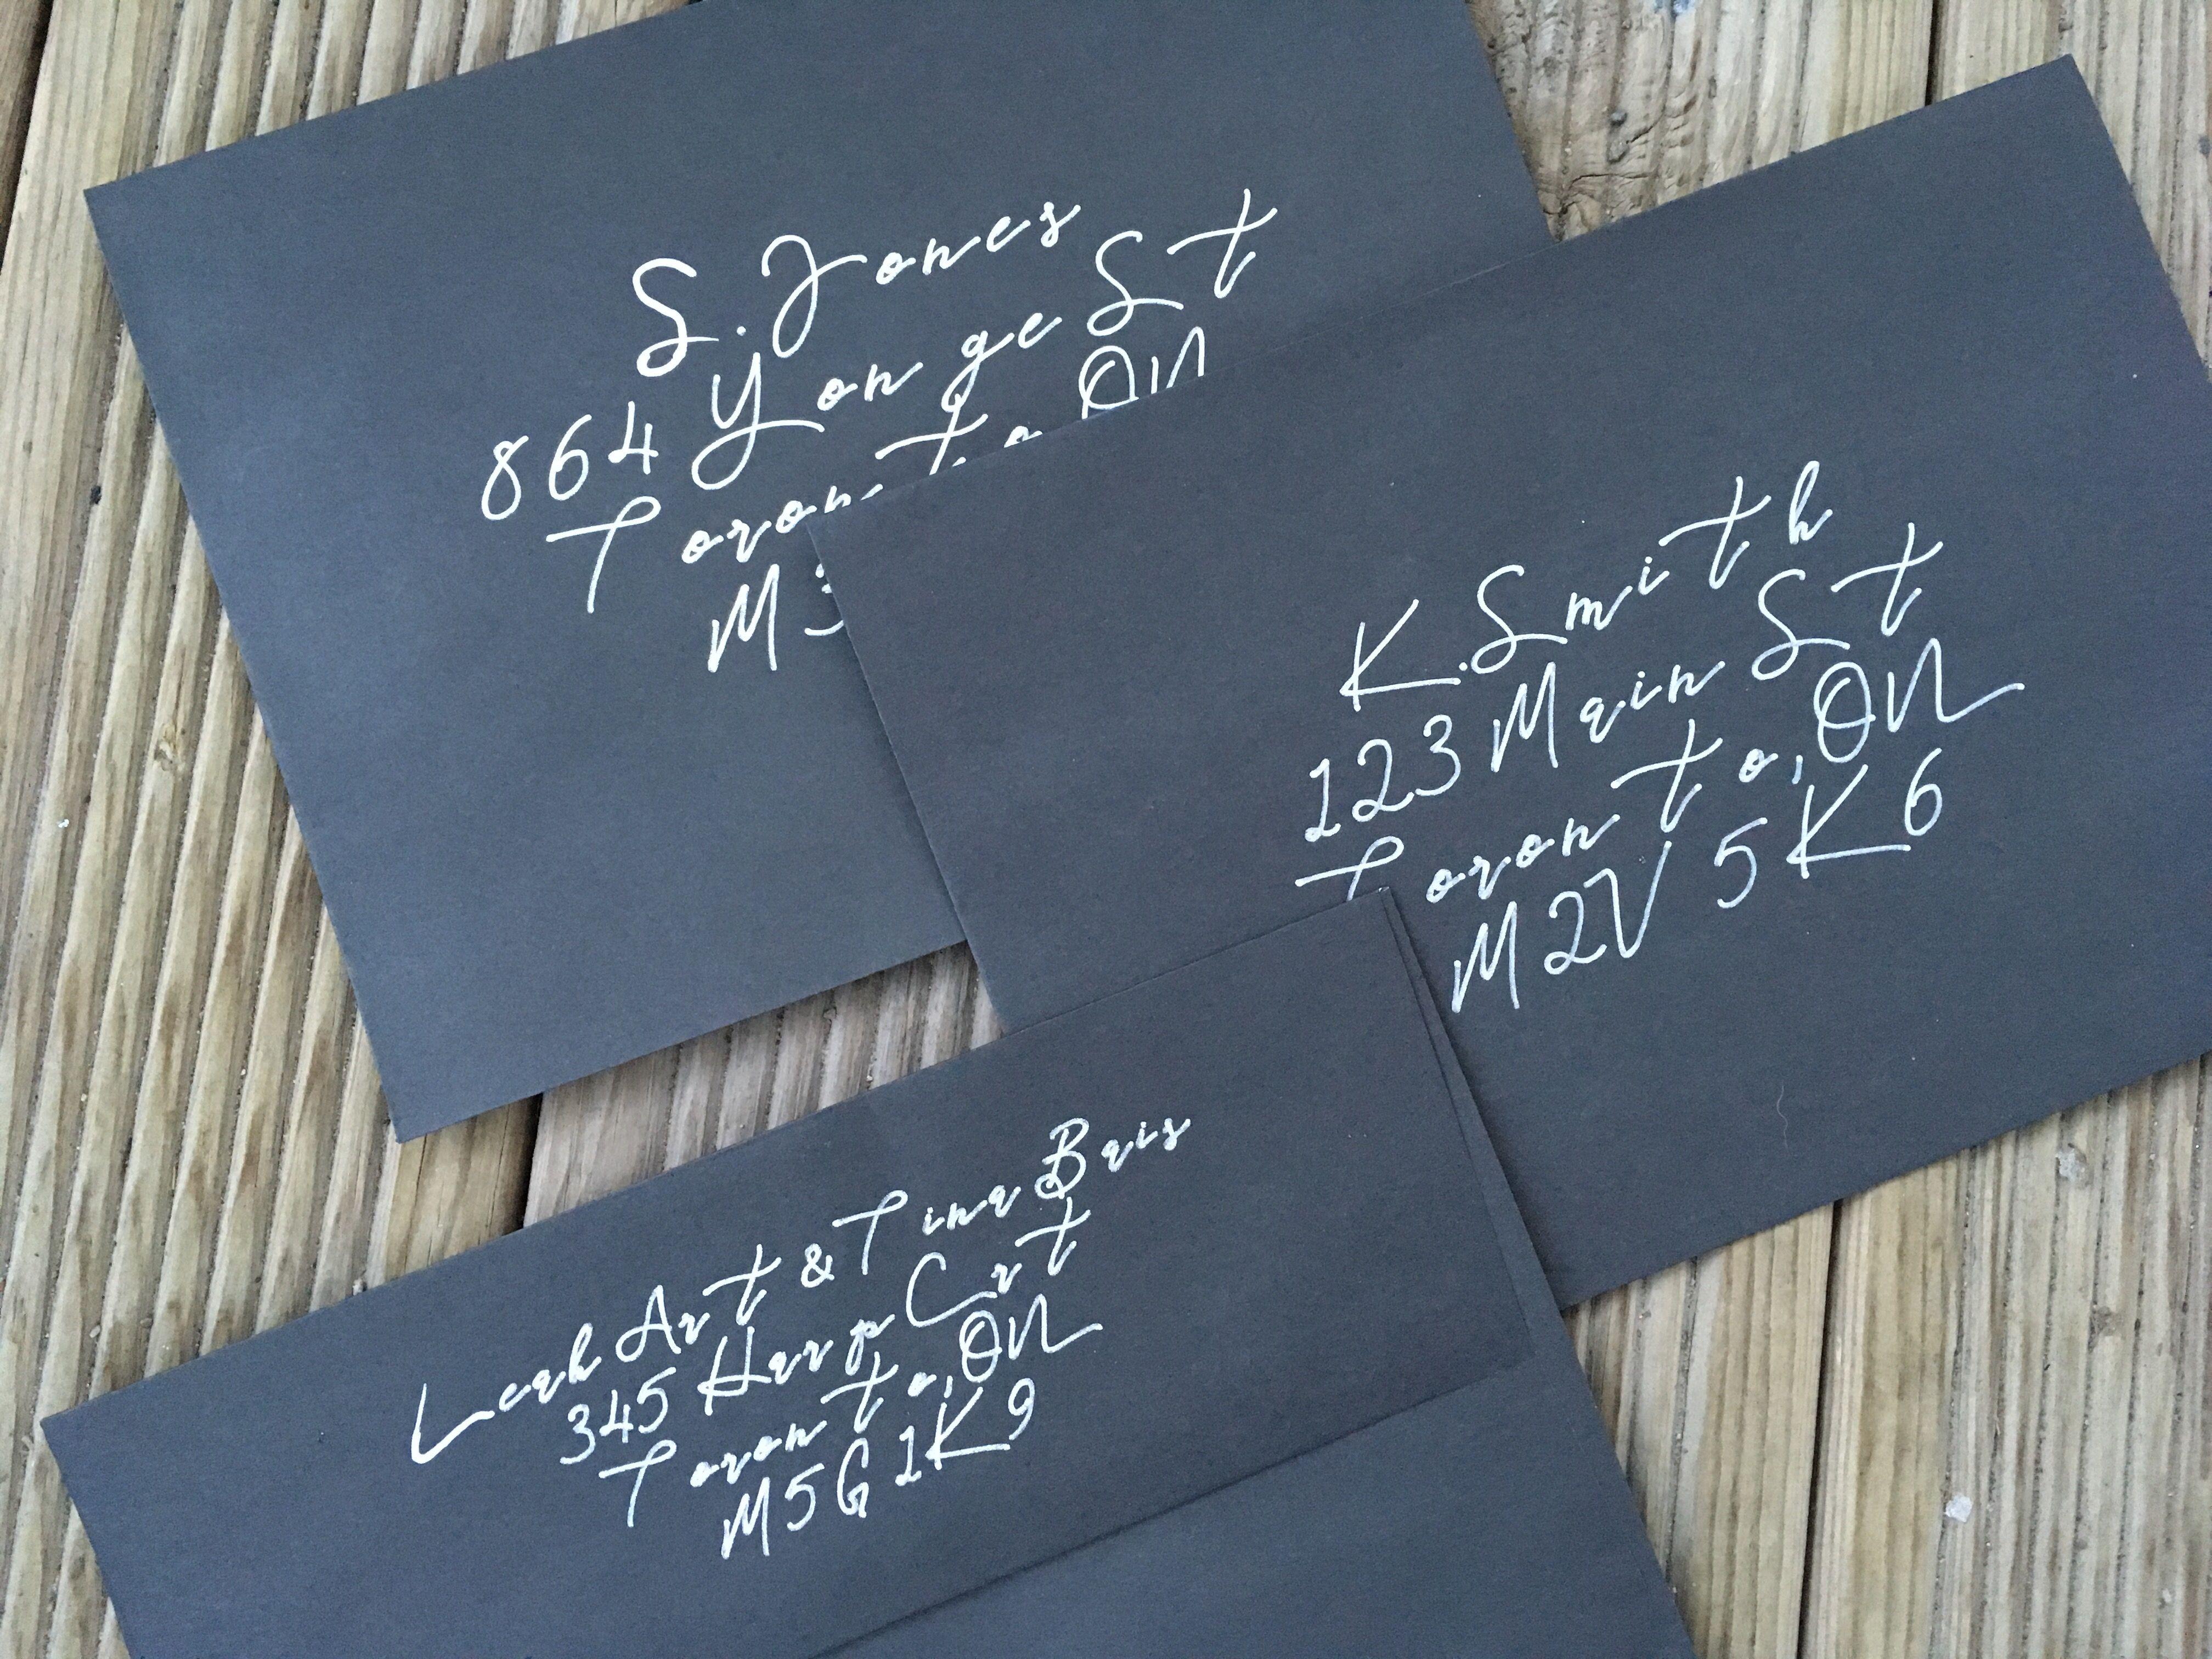 WTF How to Label Dark Envelopes Addressing envelopes